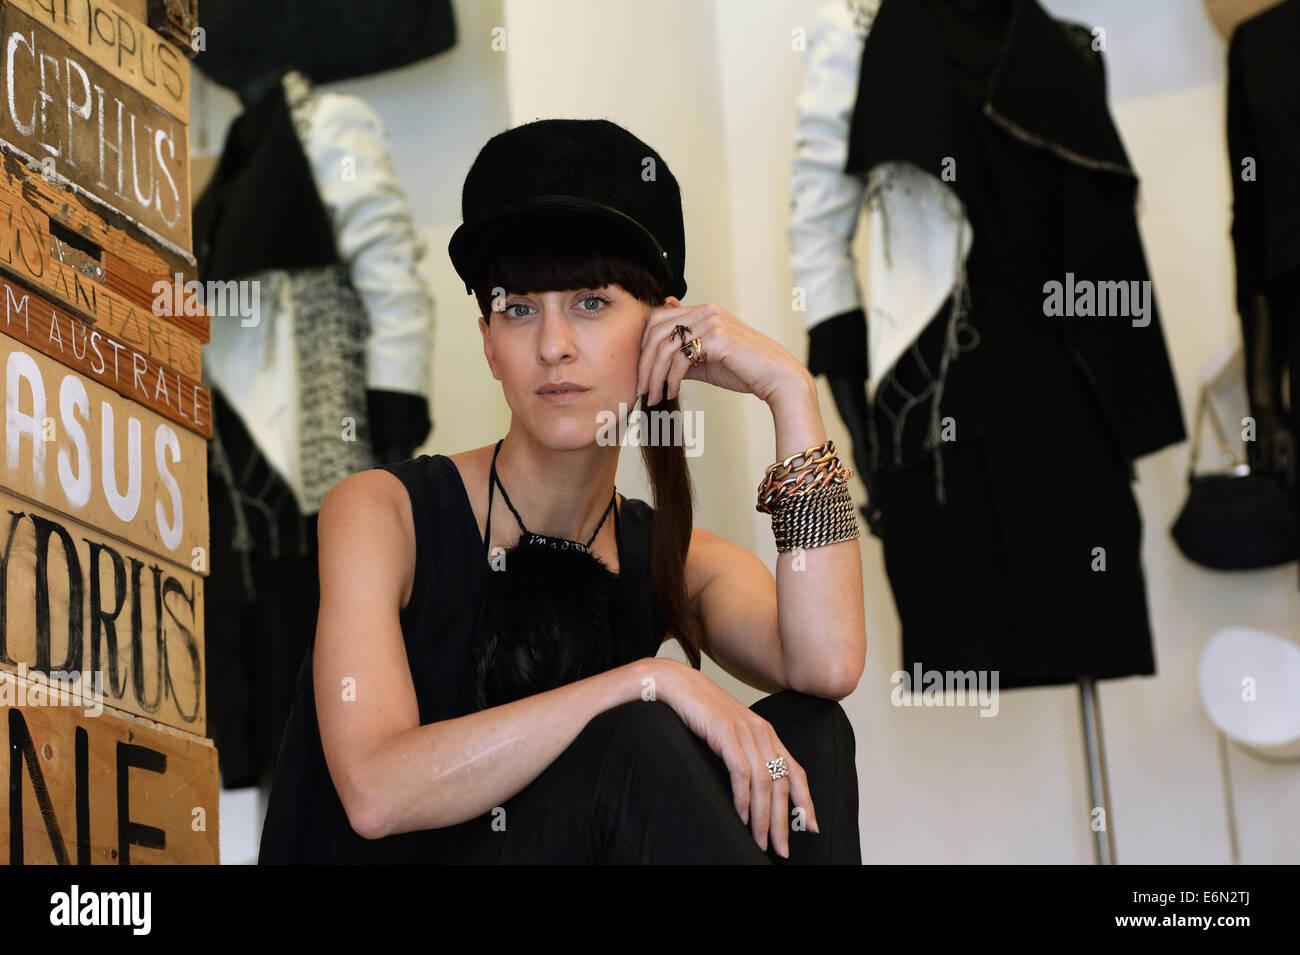 EXCLUSIVE - Berlin fashion designer Esther Perbandt is pictured in her studio on Almstadtstrasse in Berlin, Germany, - Stock Image